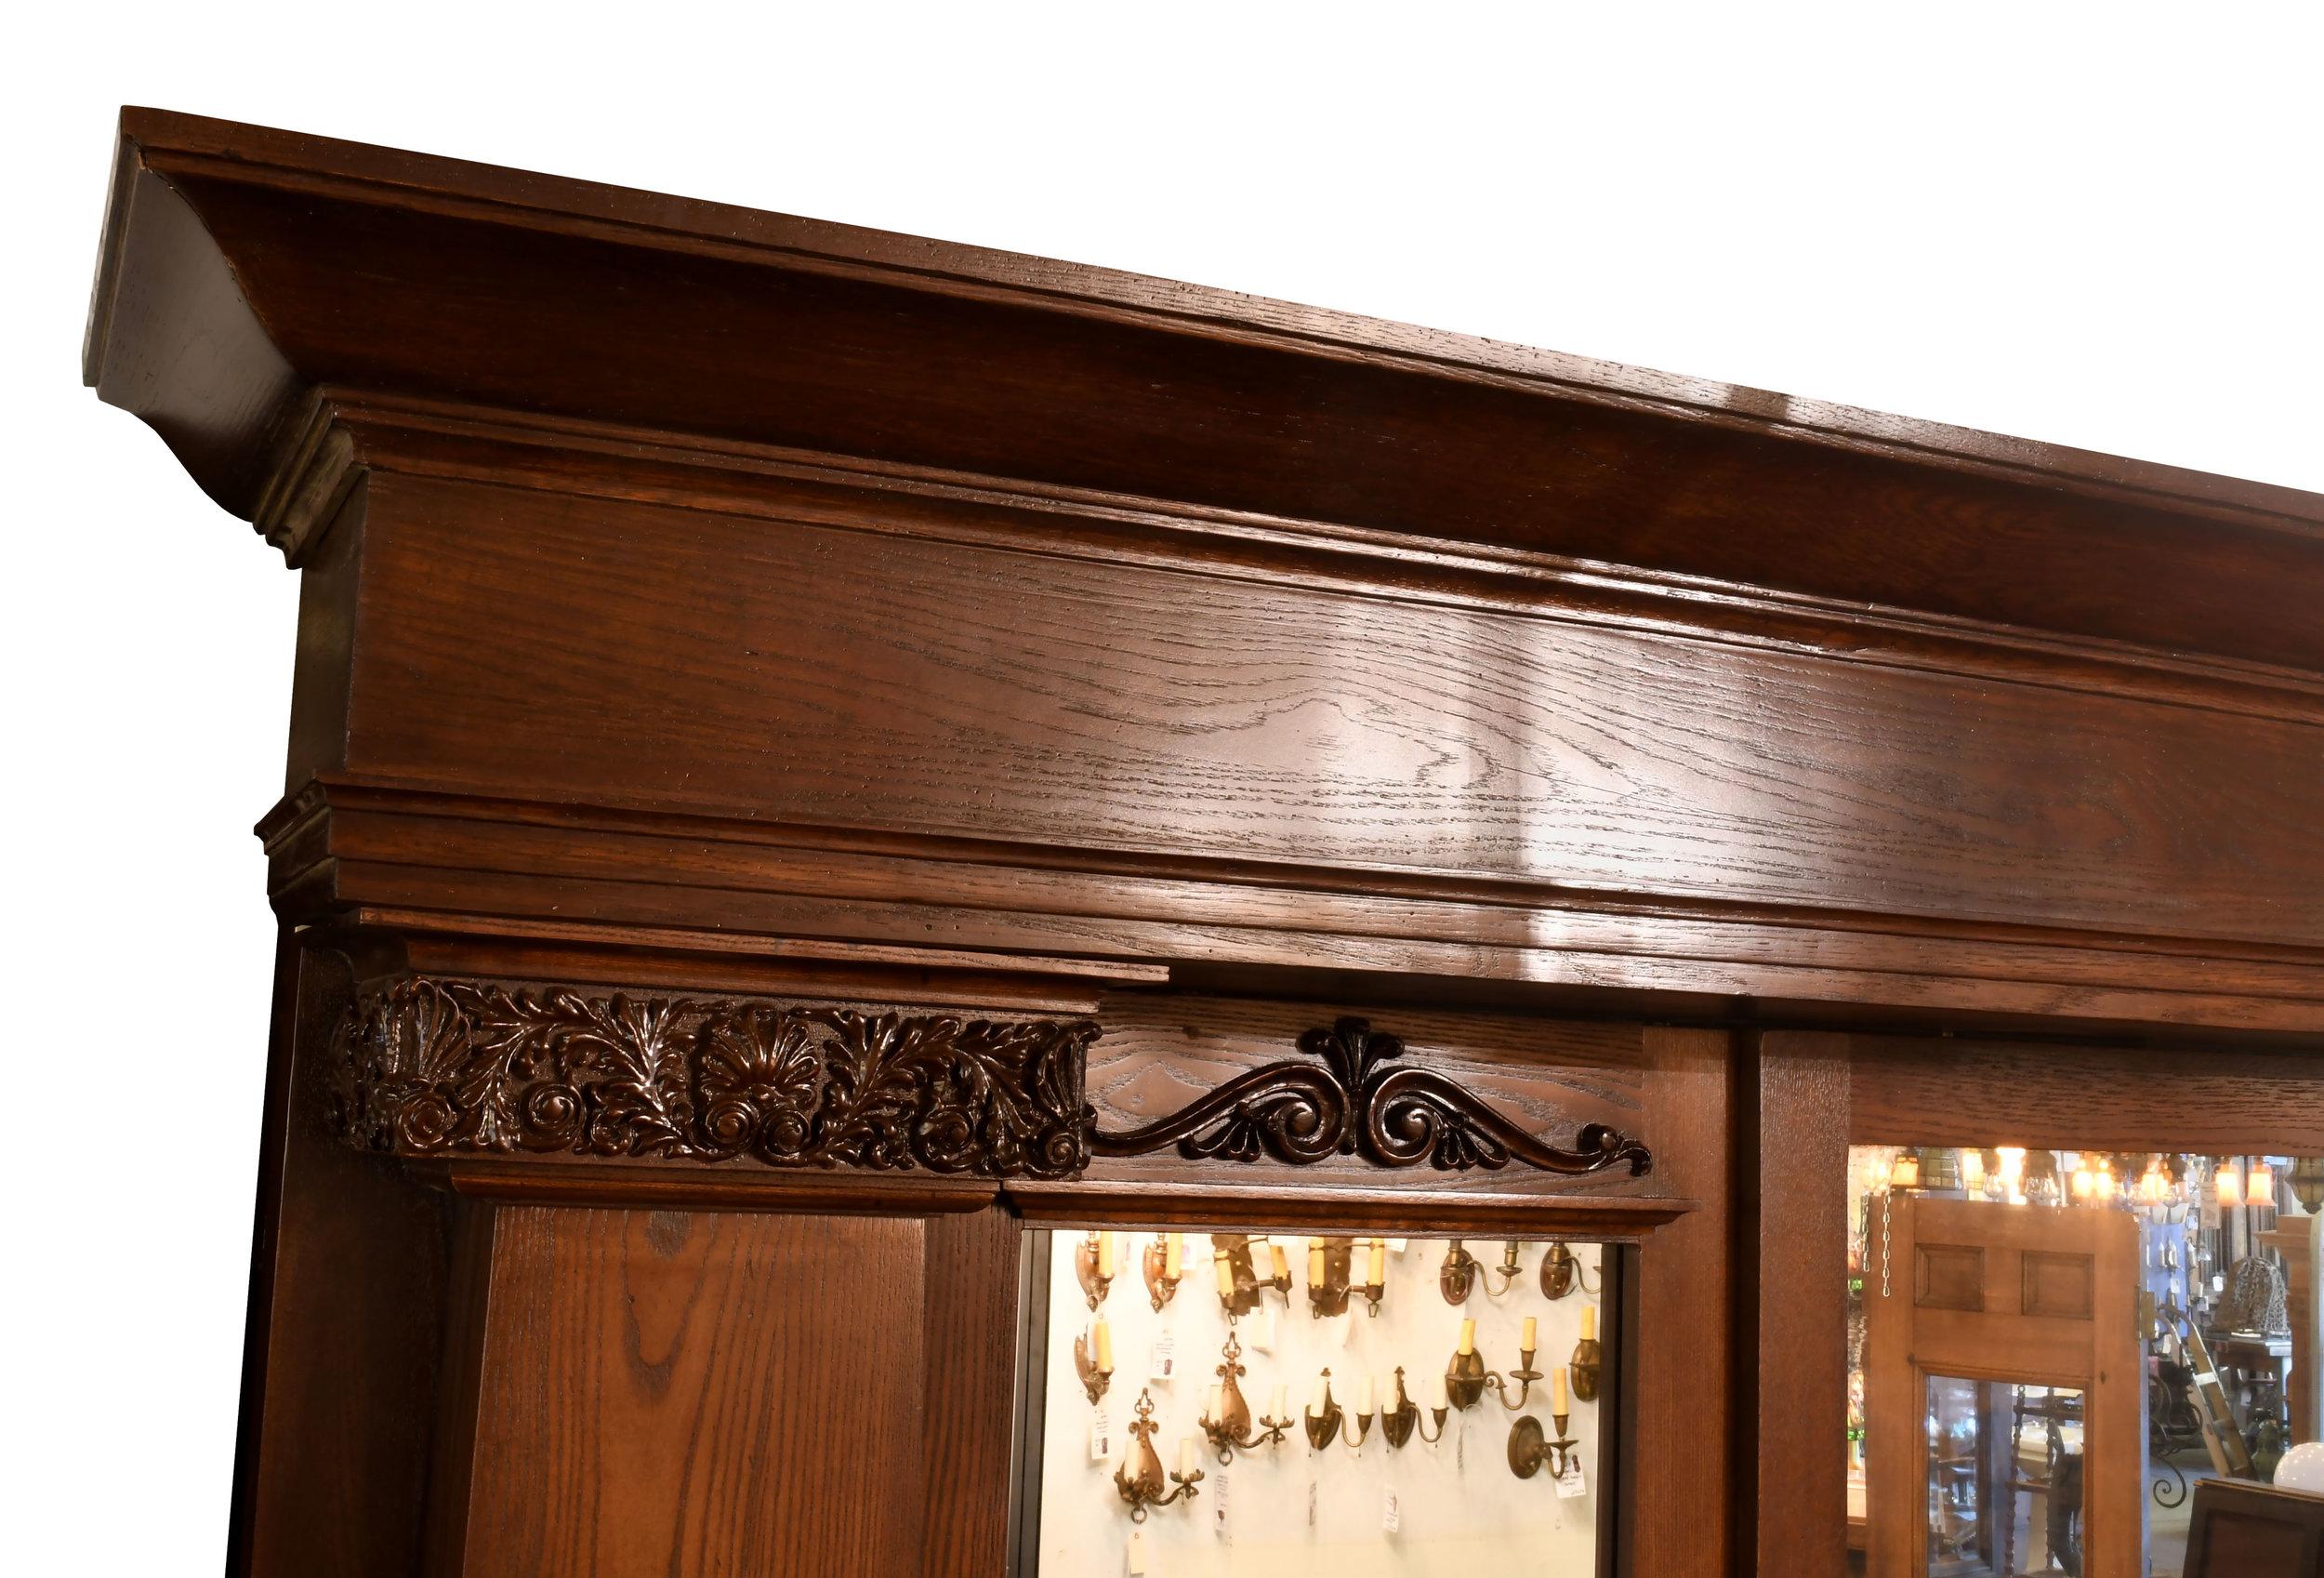 47422-brunswick-bar-upper-detail.jpg